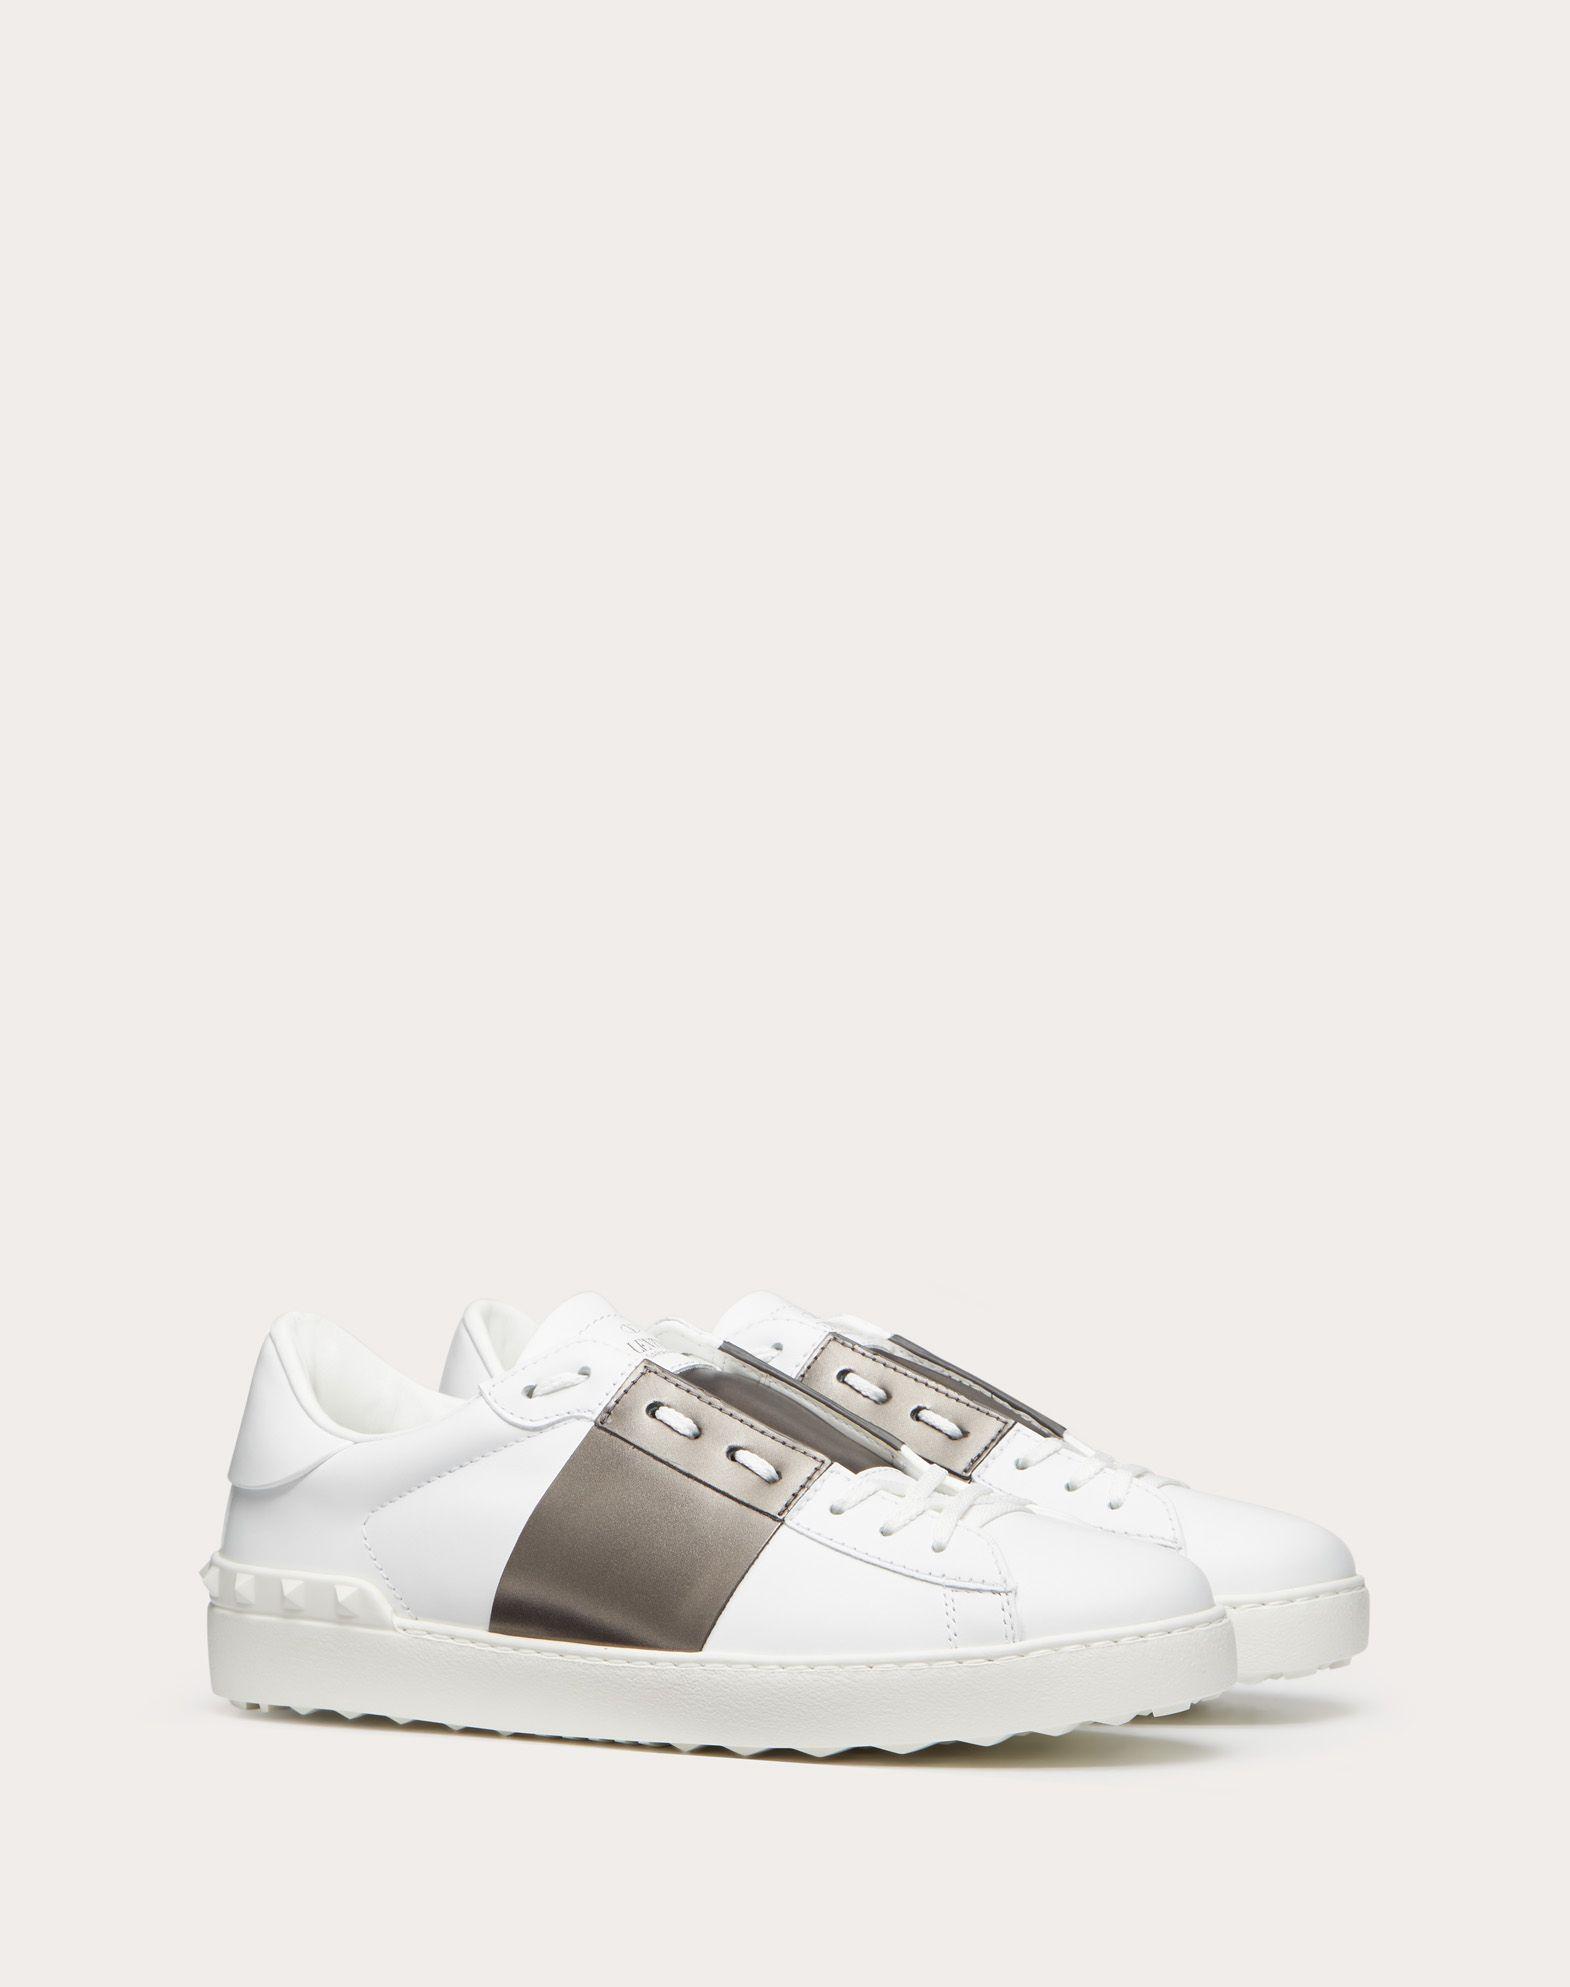 VALENTINO GARAVANI UOMO Open low-top sneaker LOW-TOP SNEAKERS U r